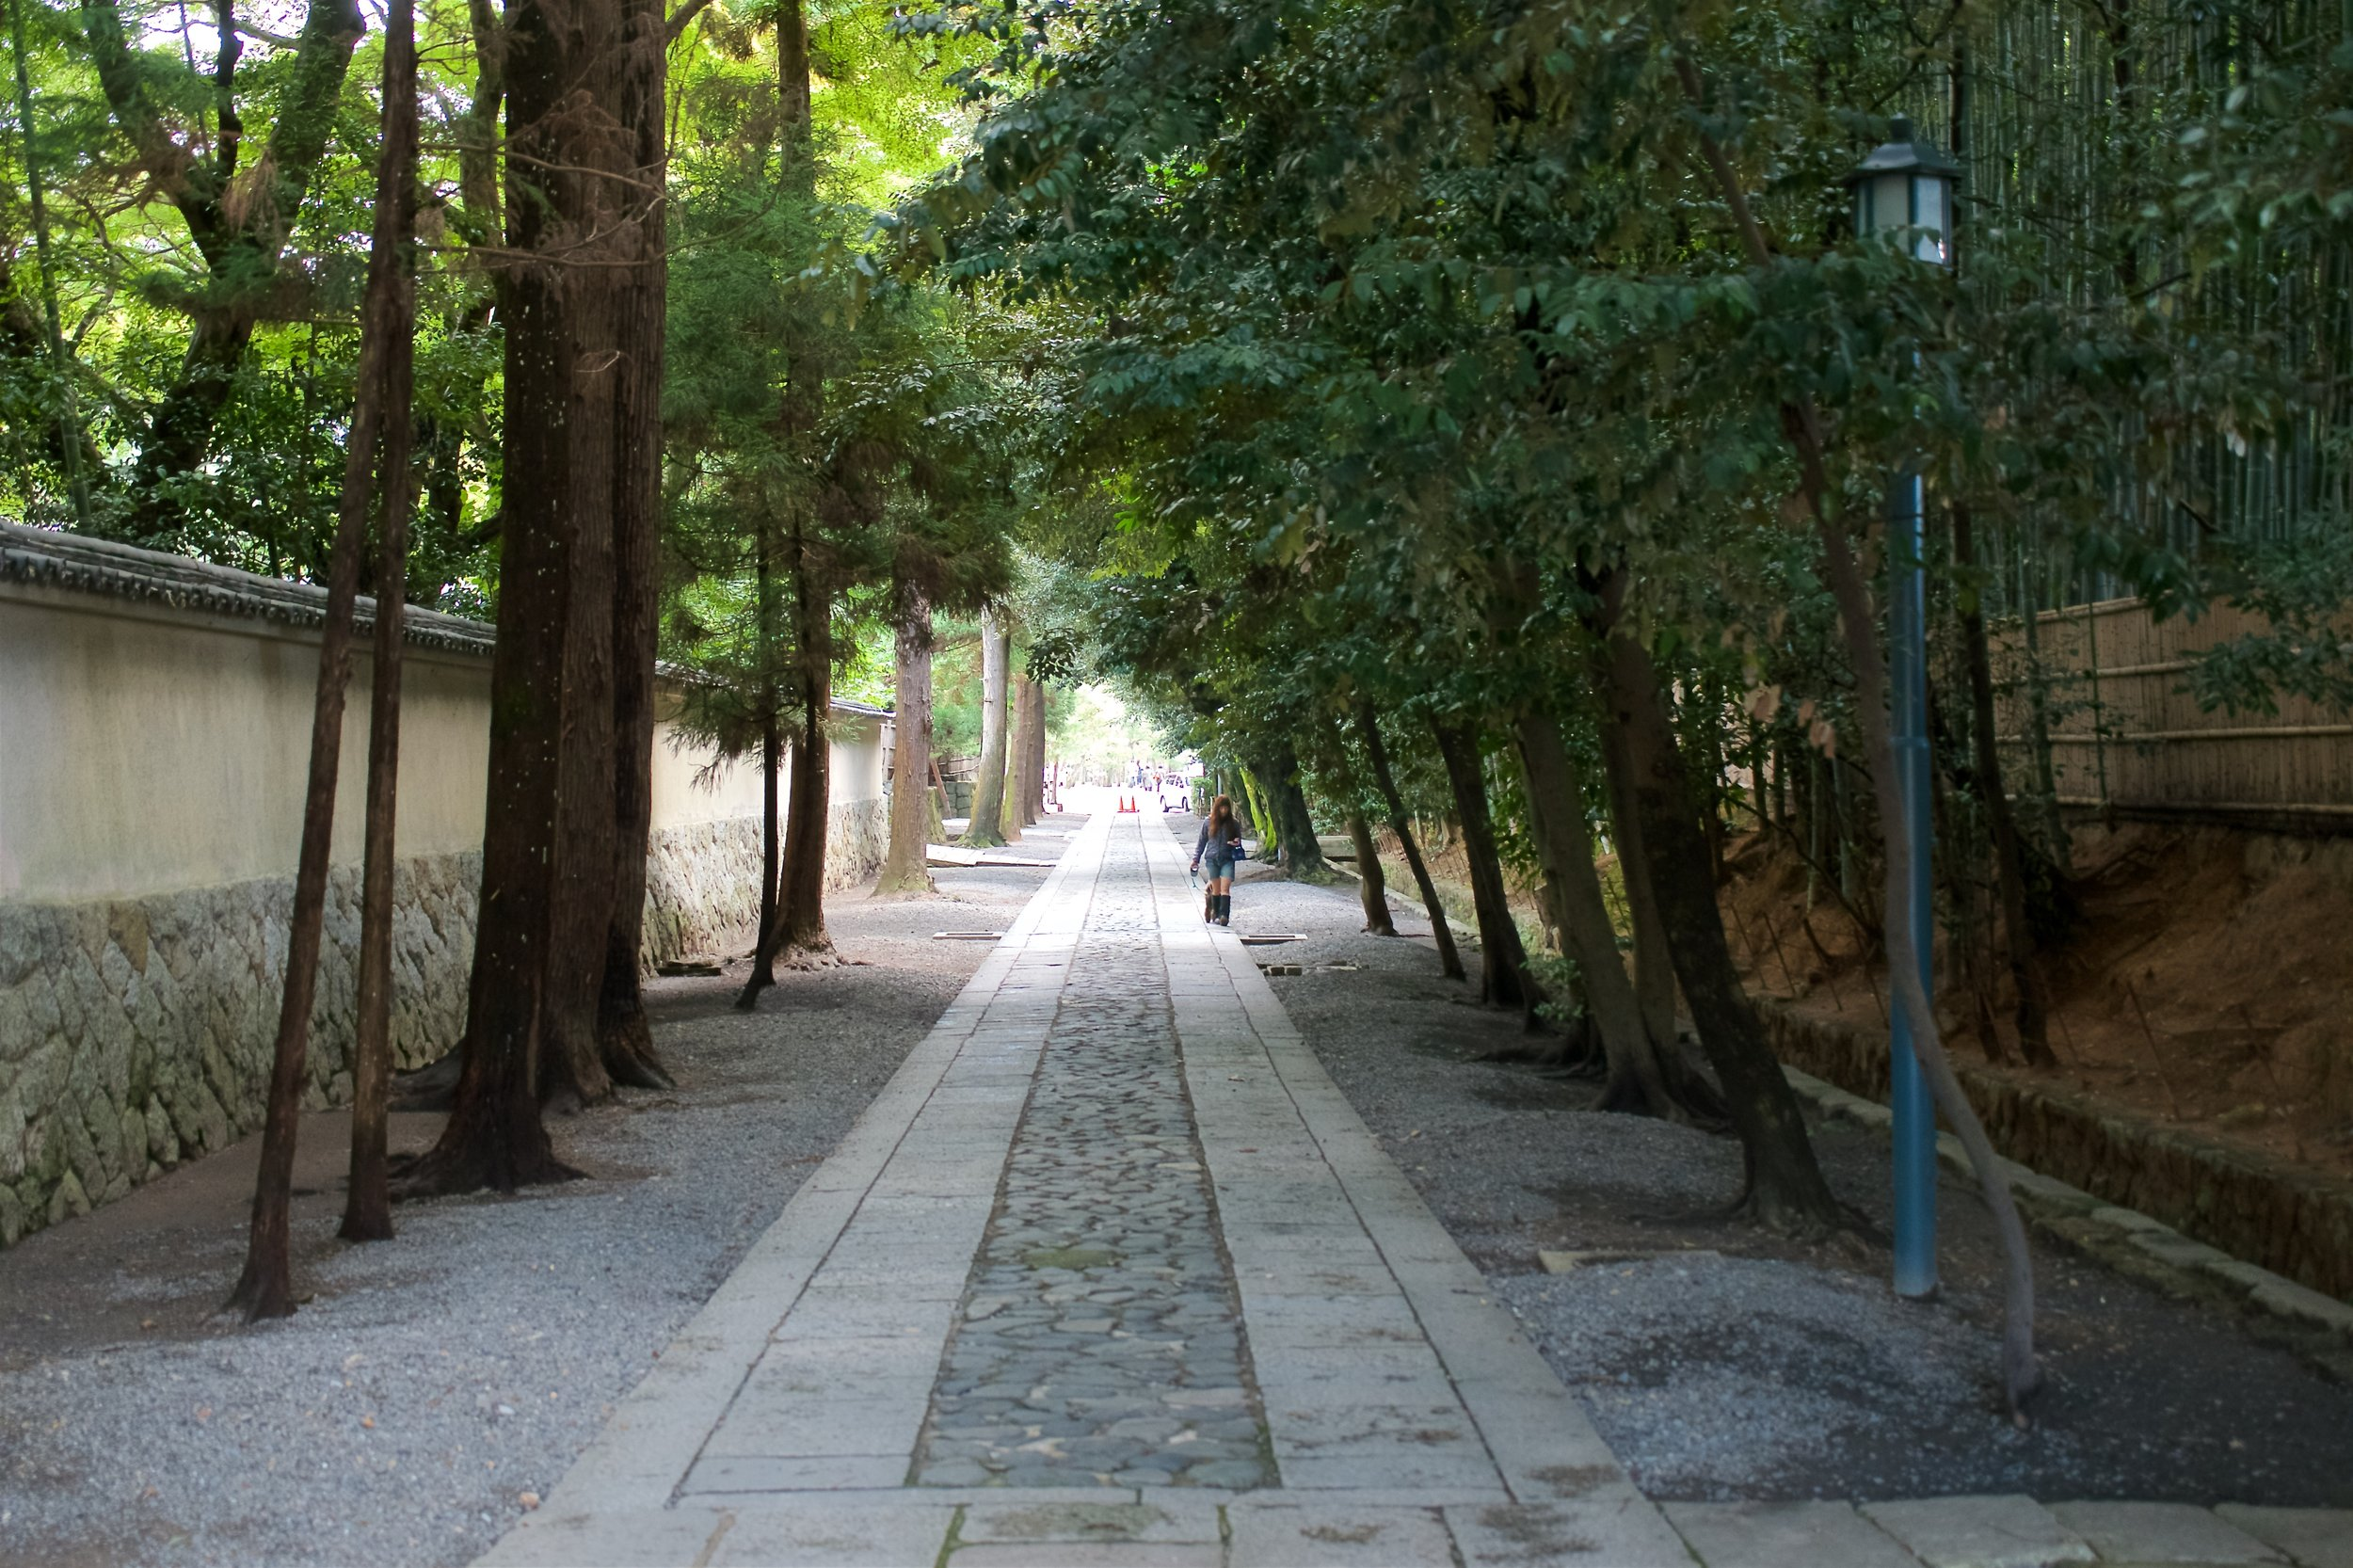 Daitoku-ji Temple had several tree-lined roads within its walls